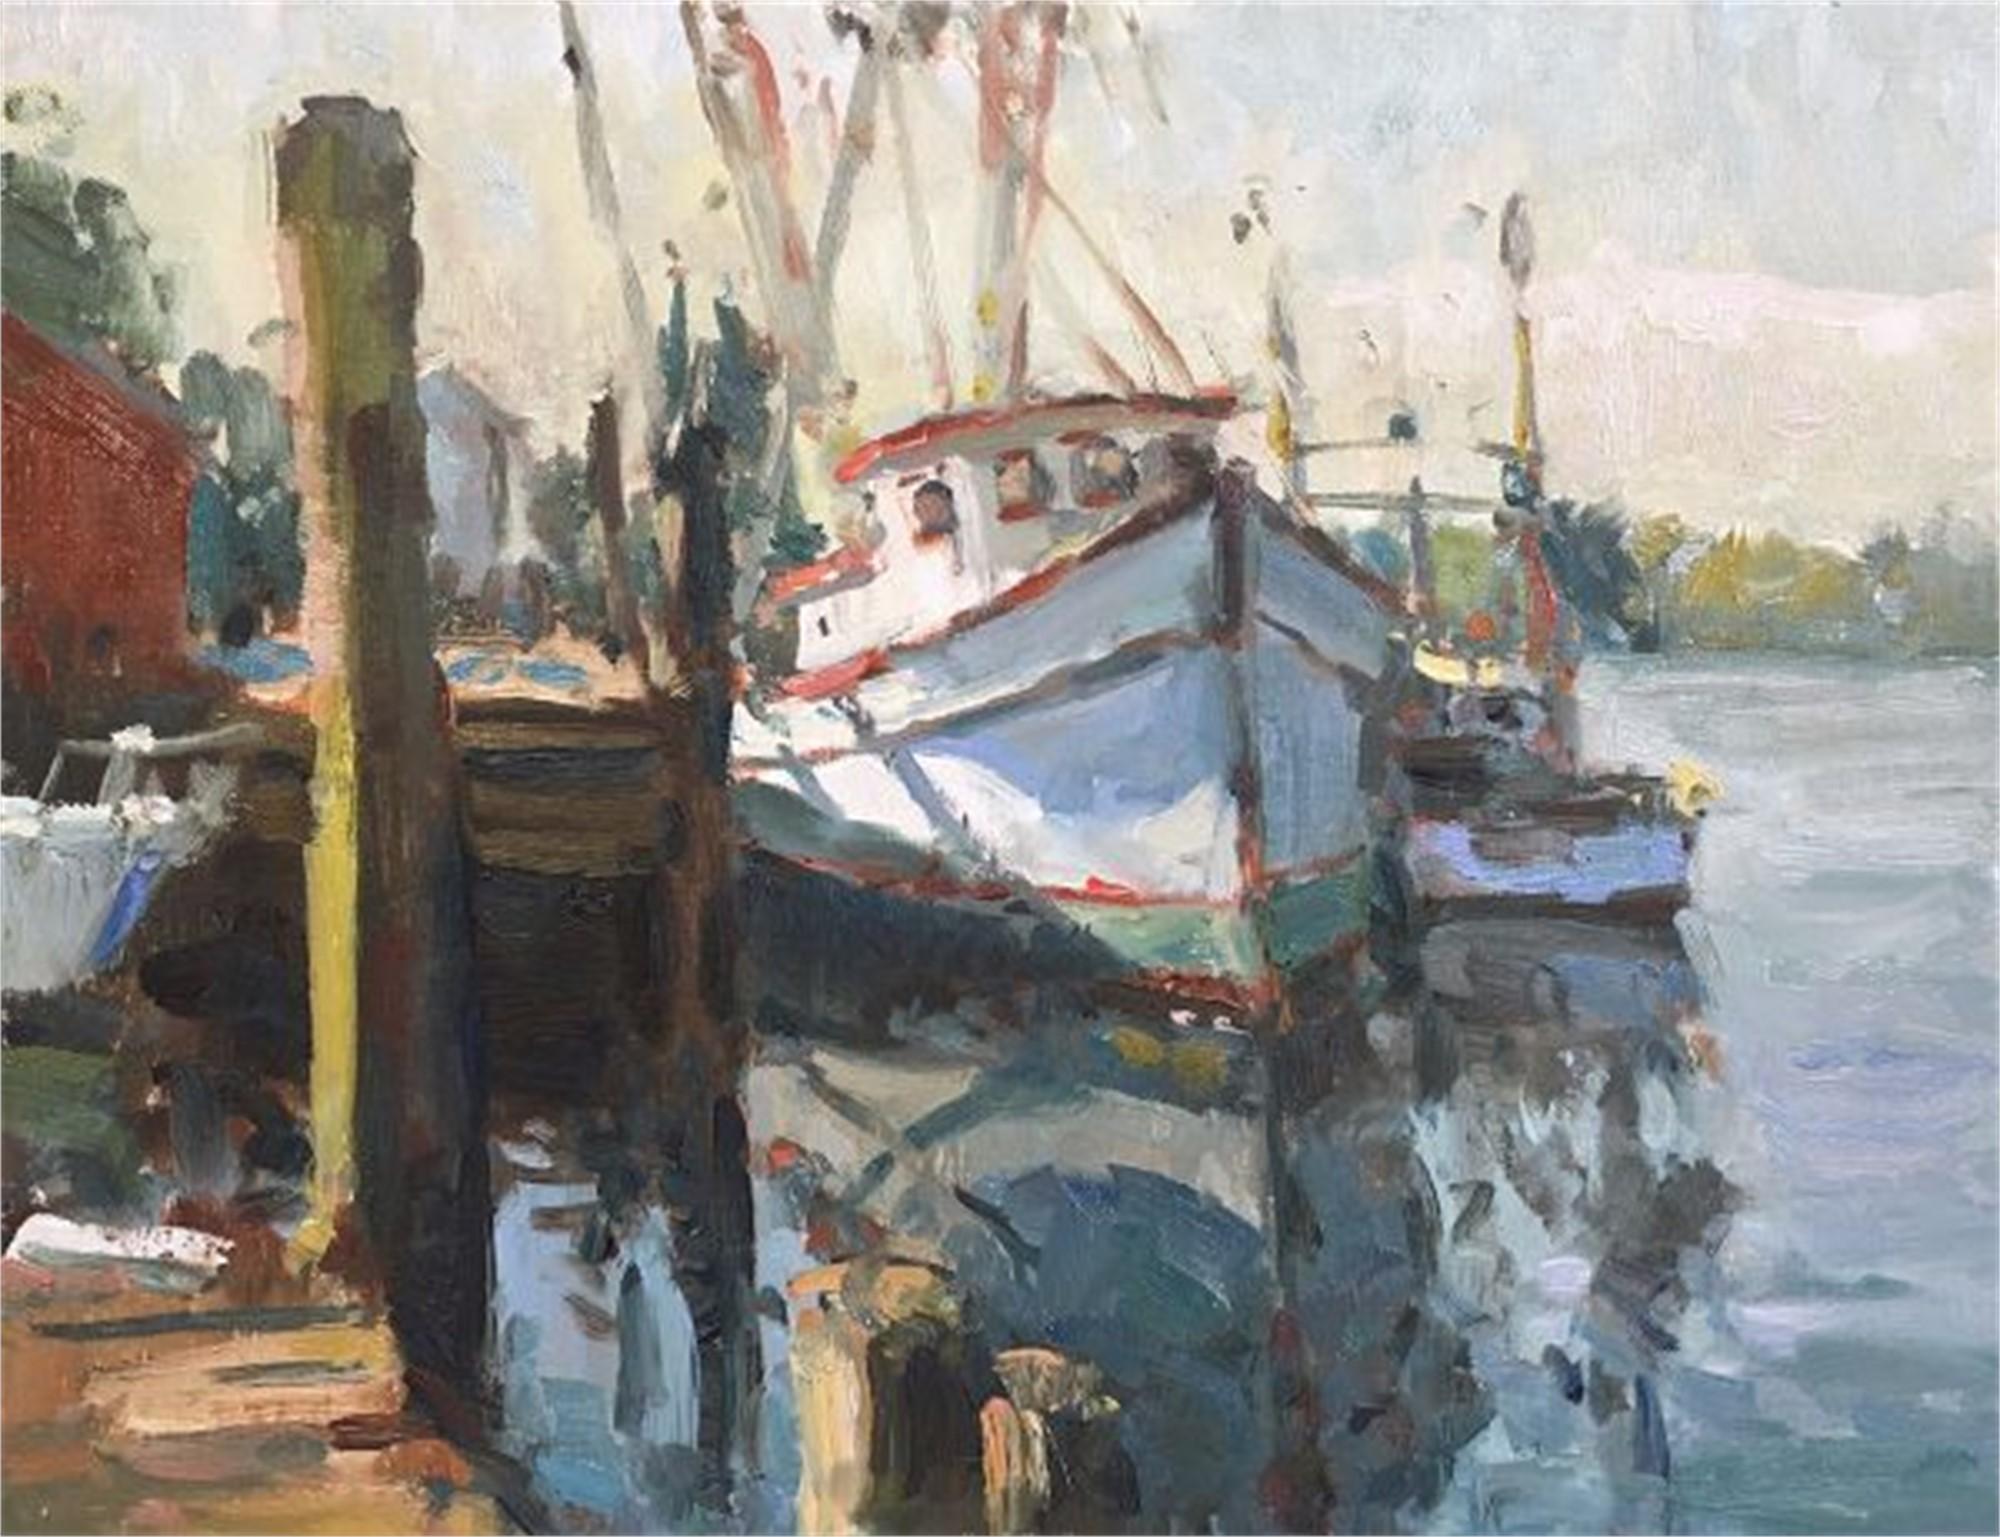 Morning Docks by Richard Oversmith